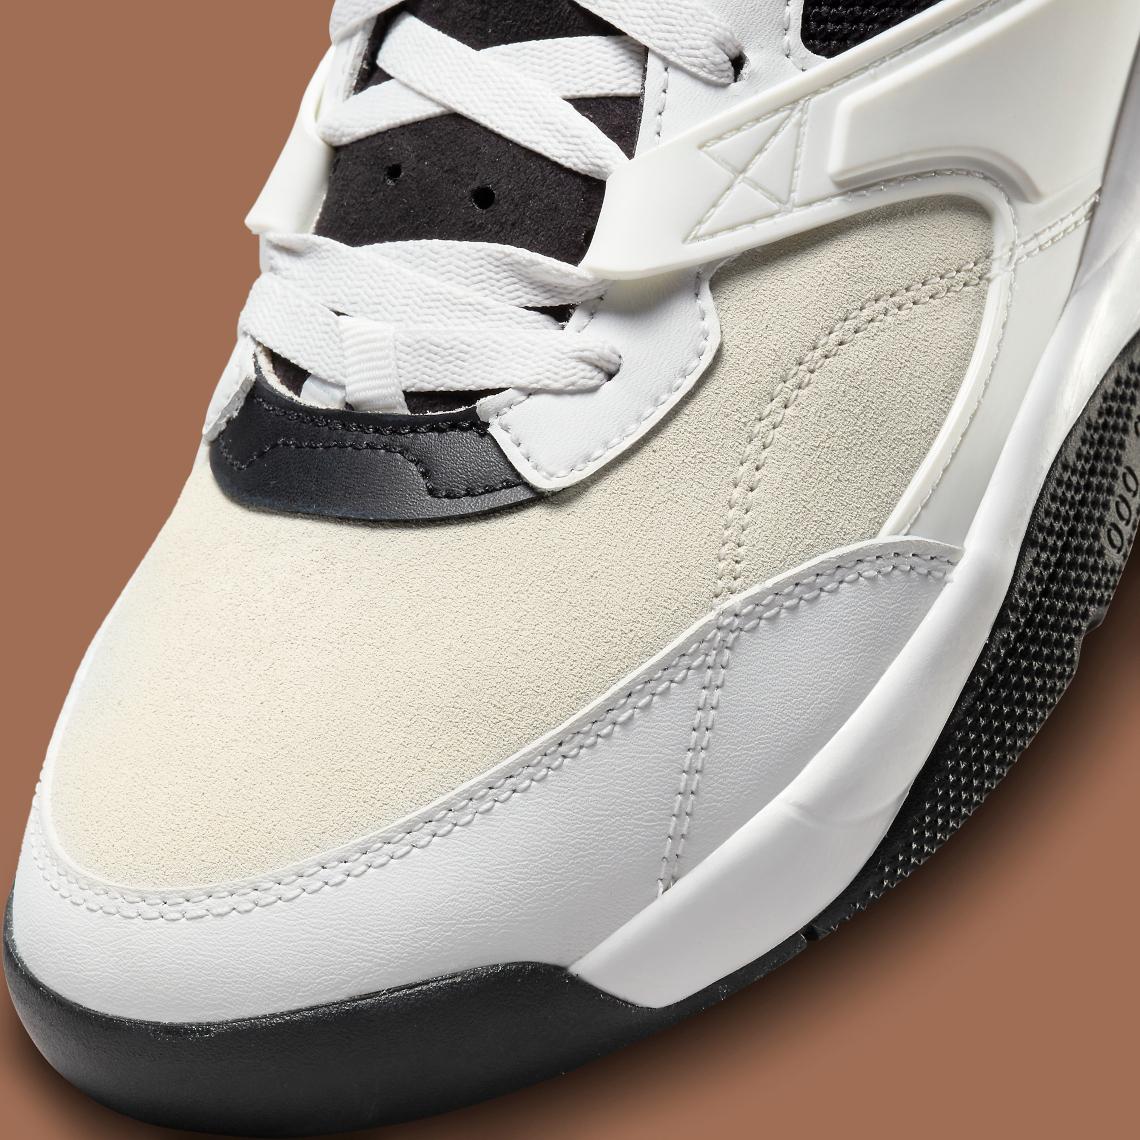 nike women roshe beige camo sneakers shoes black